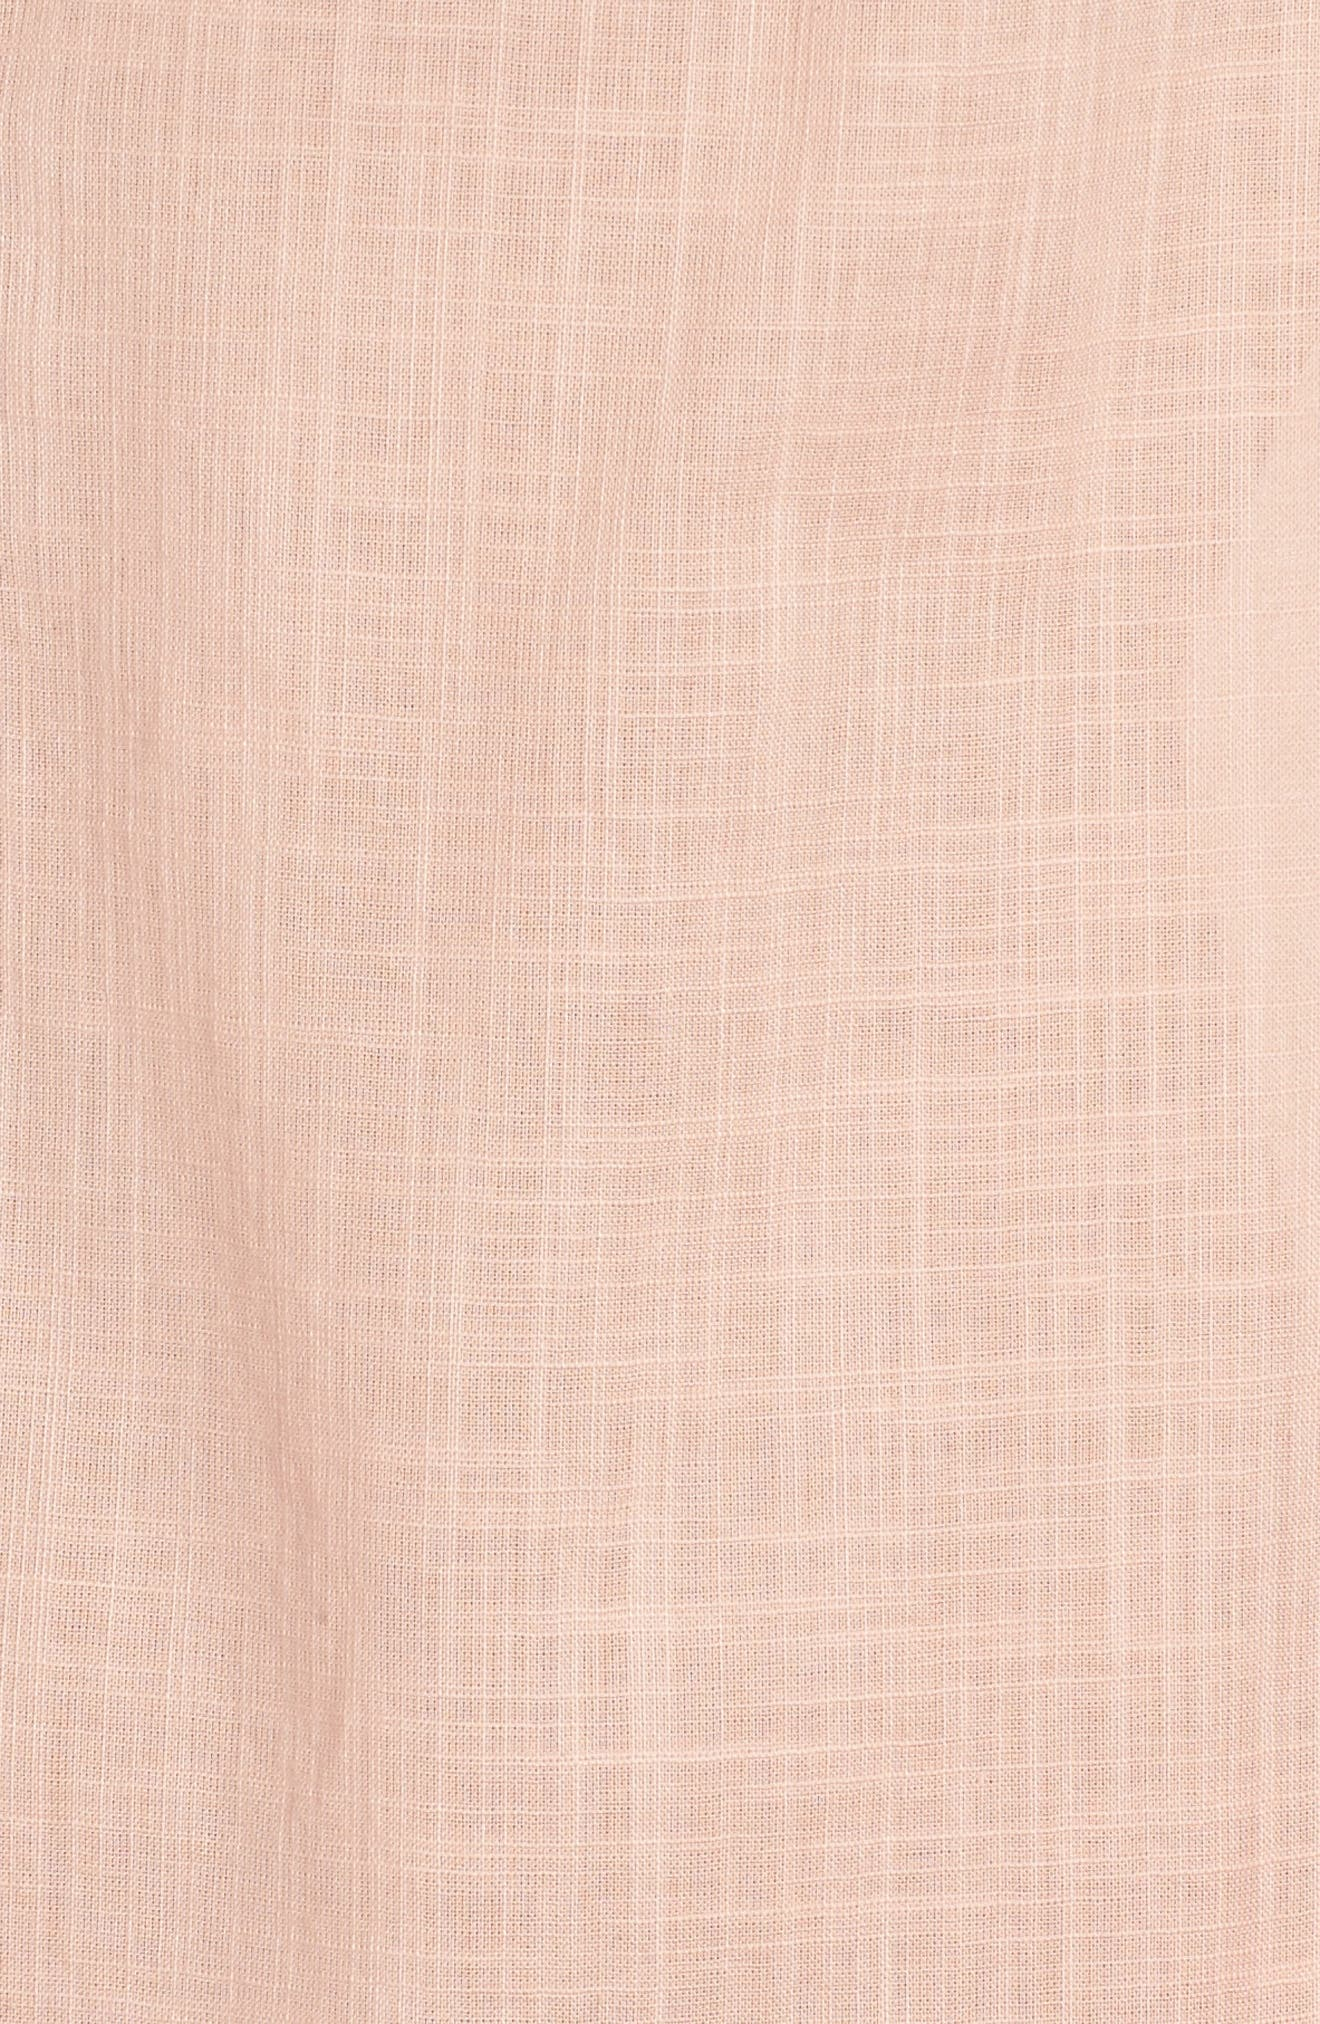 Palm Beach Cover-Up Dress,                             Alternate thumbnail 5, color,                             Peach Melba